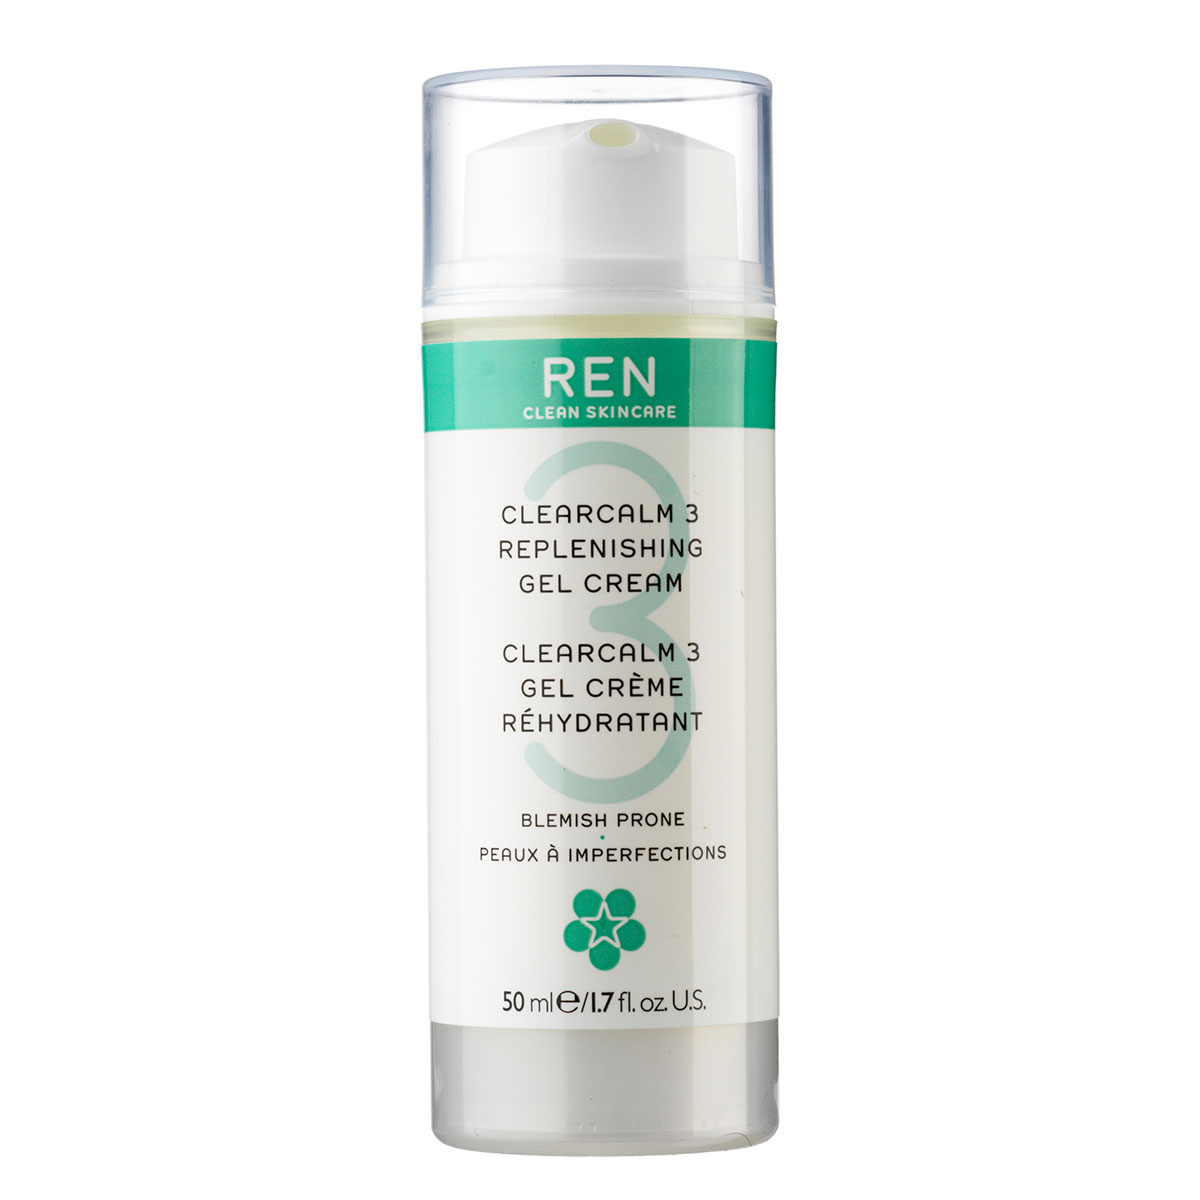 REN Replenishing Gel Cream - 50 ml